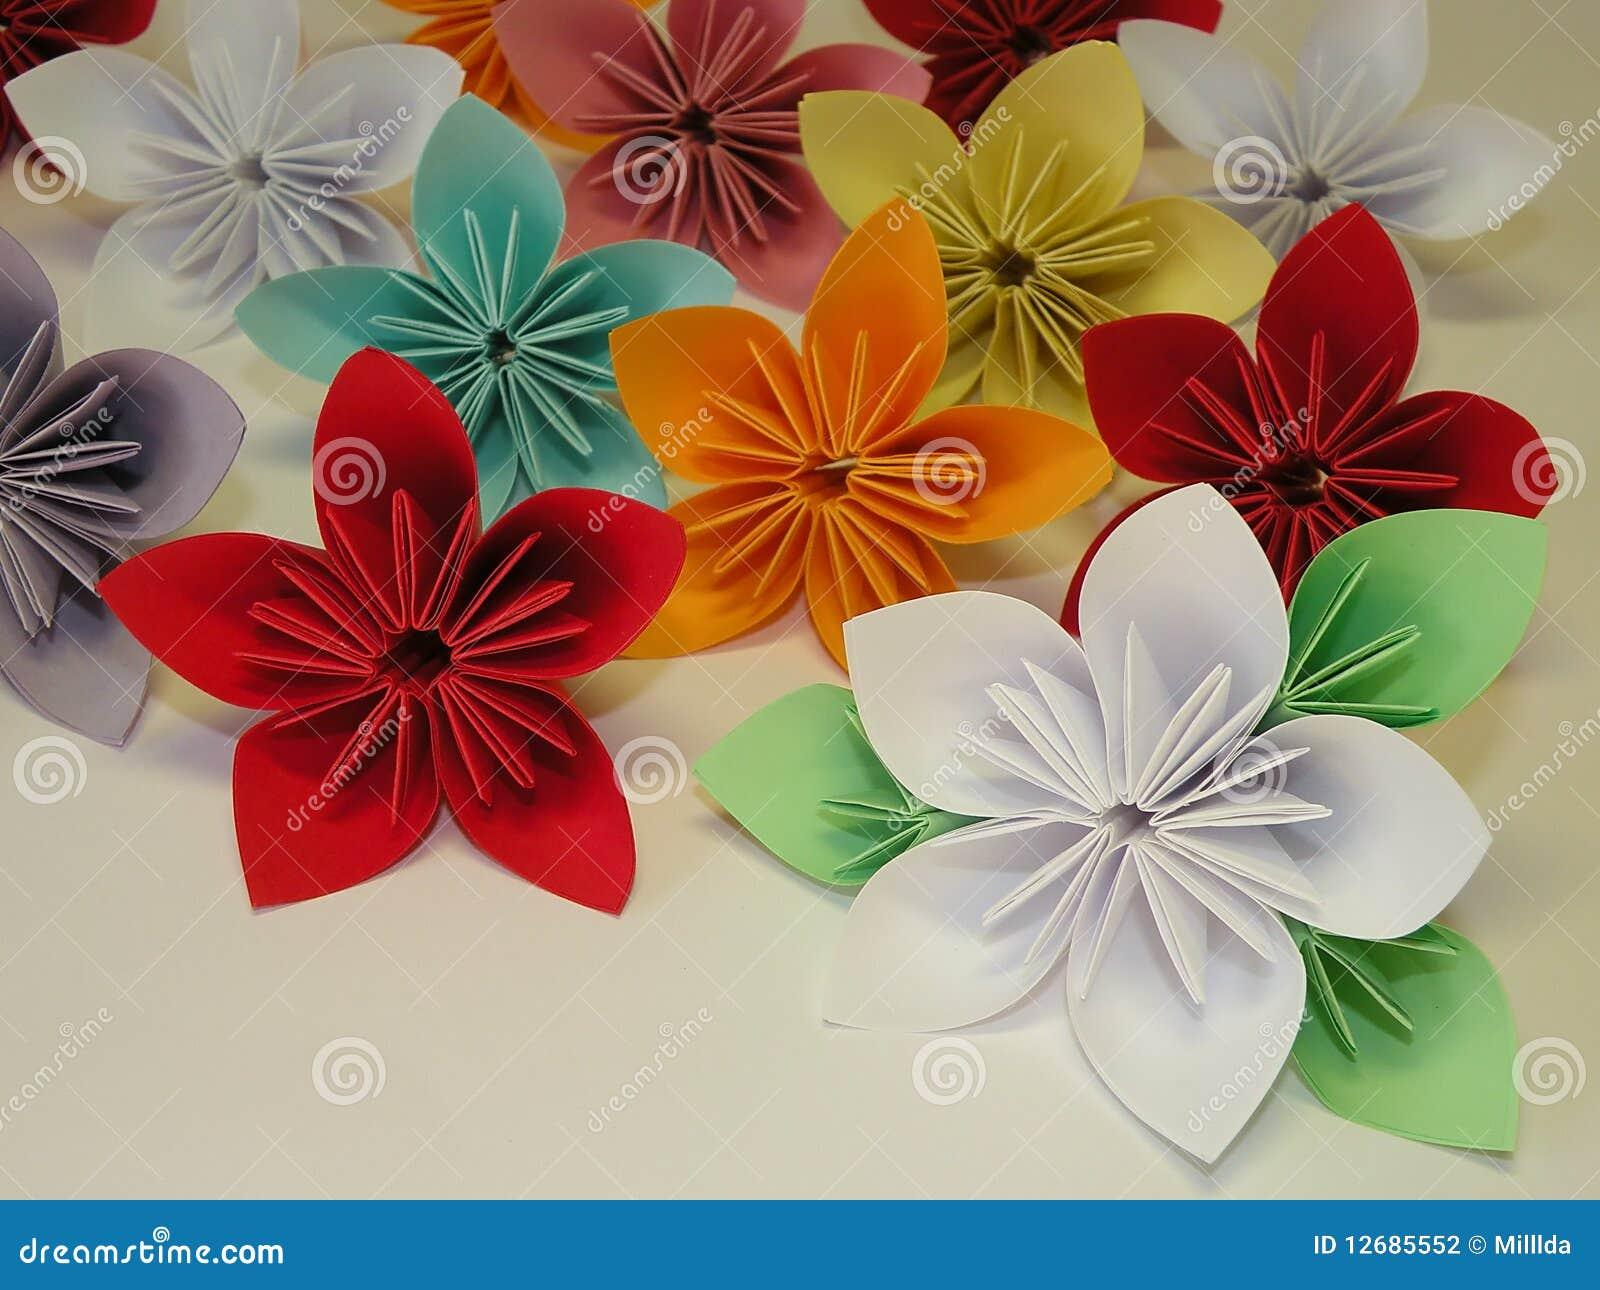 Origami Flowers Stock Photo Image Of Made Card Craftsmanship